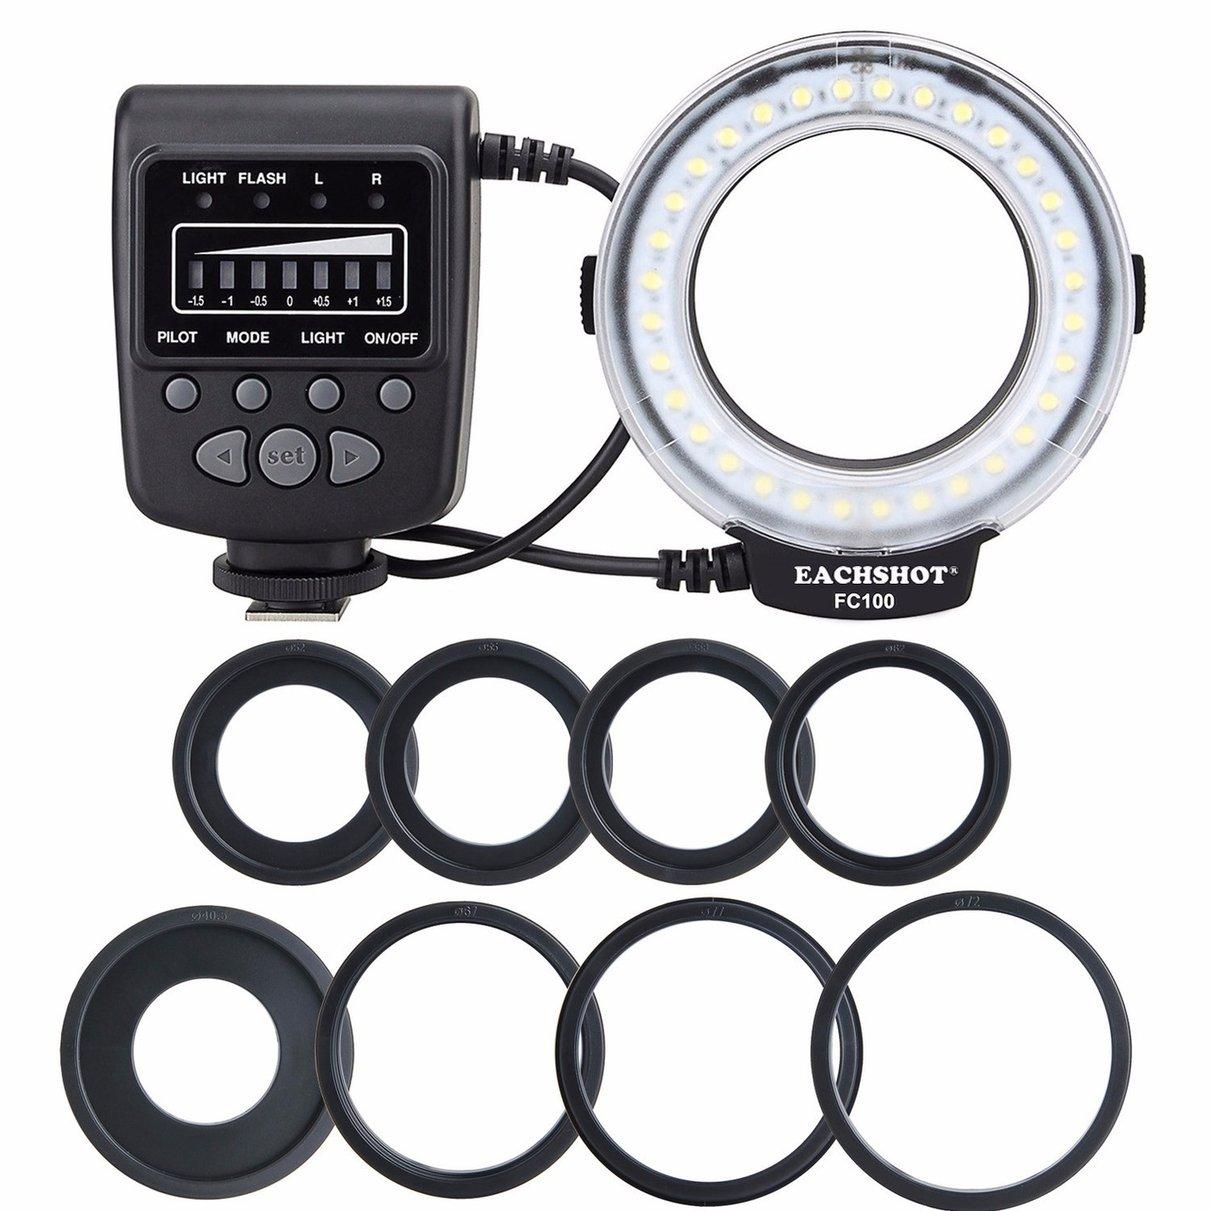 Meike FC-100 FC100 Macro Ring Flash/Lumière MK FC 100 pour Canon pour EOS 650D 600D 60D 7D 550D 1100D T5i T4i T3i T3